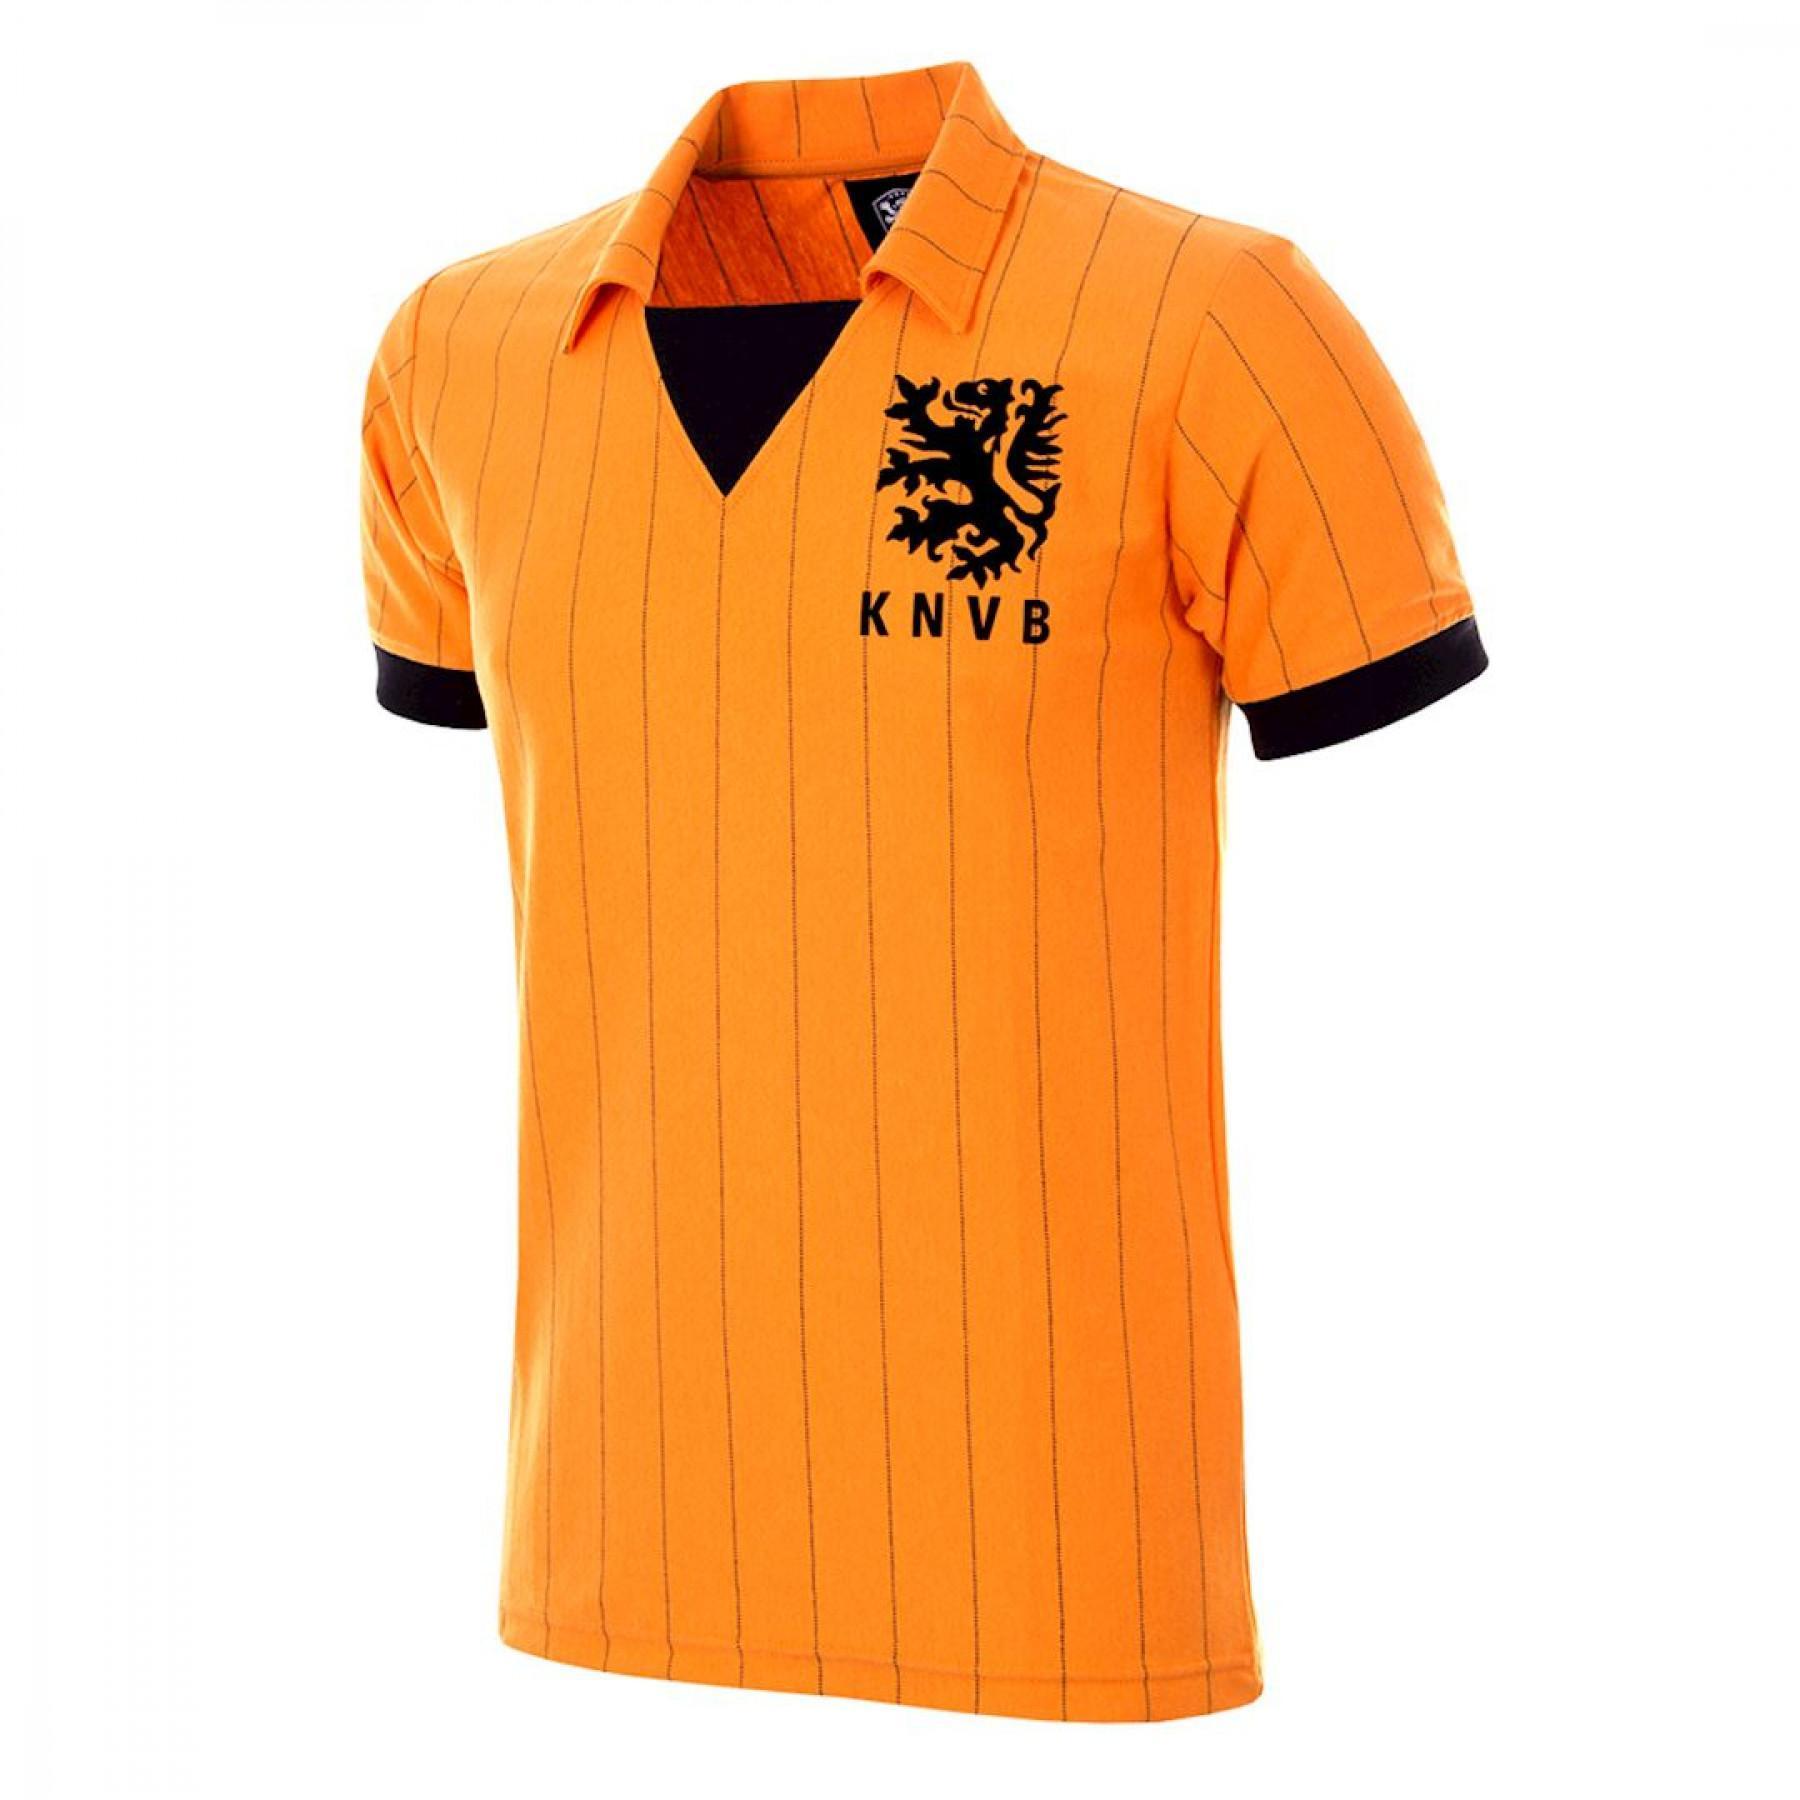 Retro jersey Pays-Bas 1983